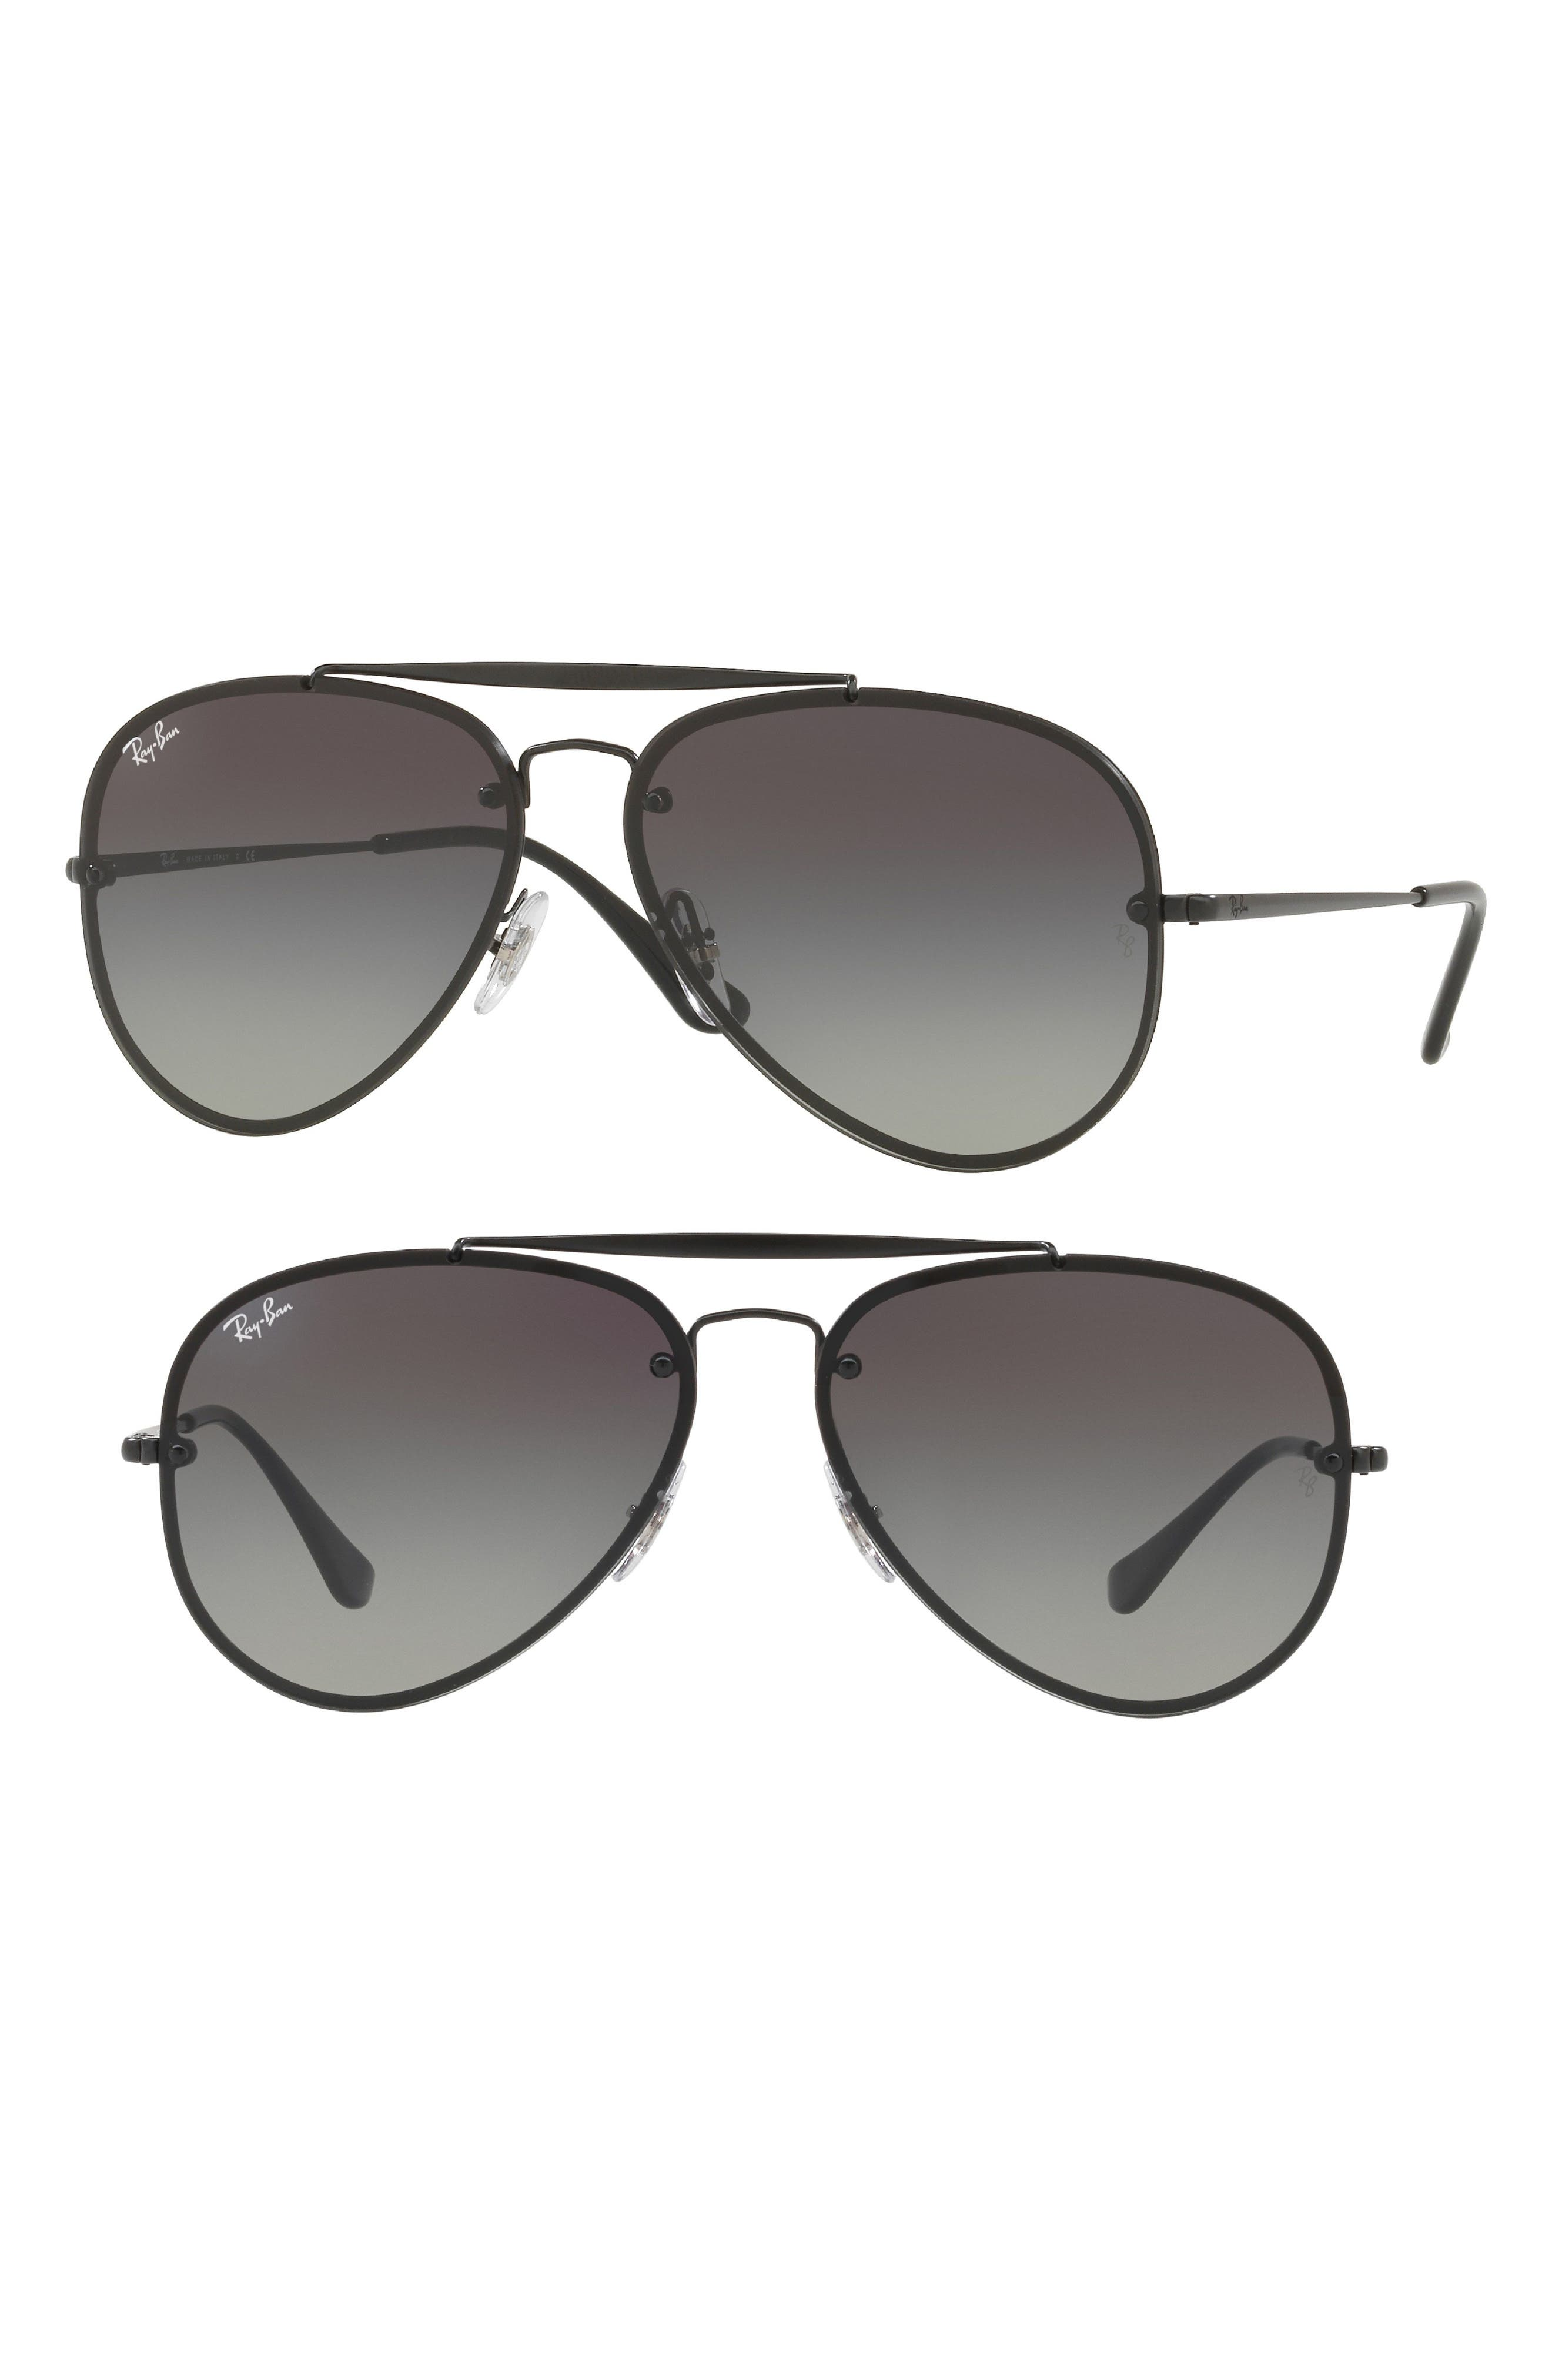 58mm Aviator Sunglasses,                         Main,                         color, Shiny Black